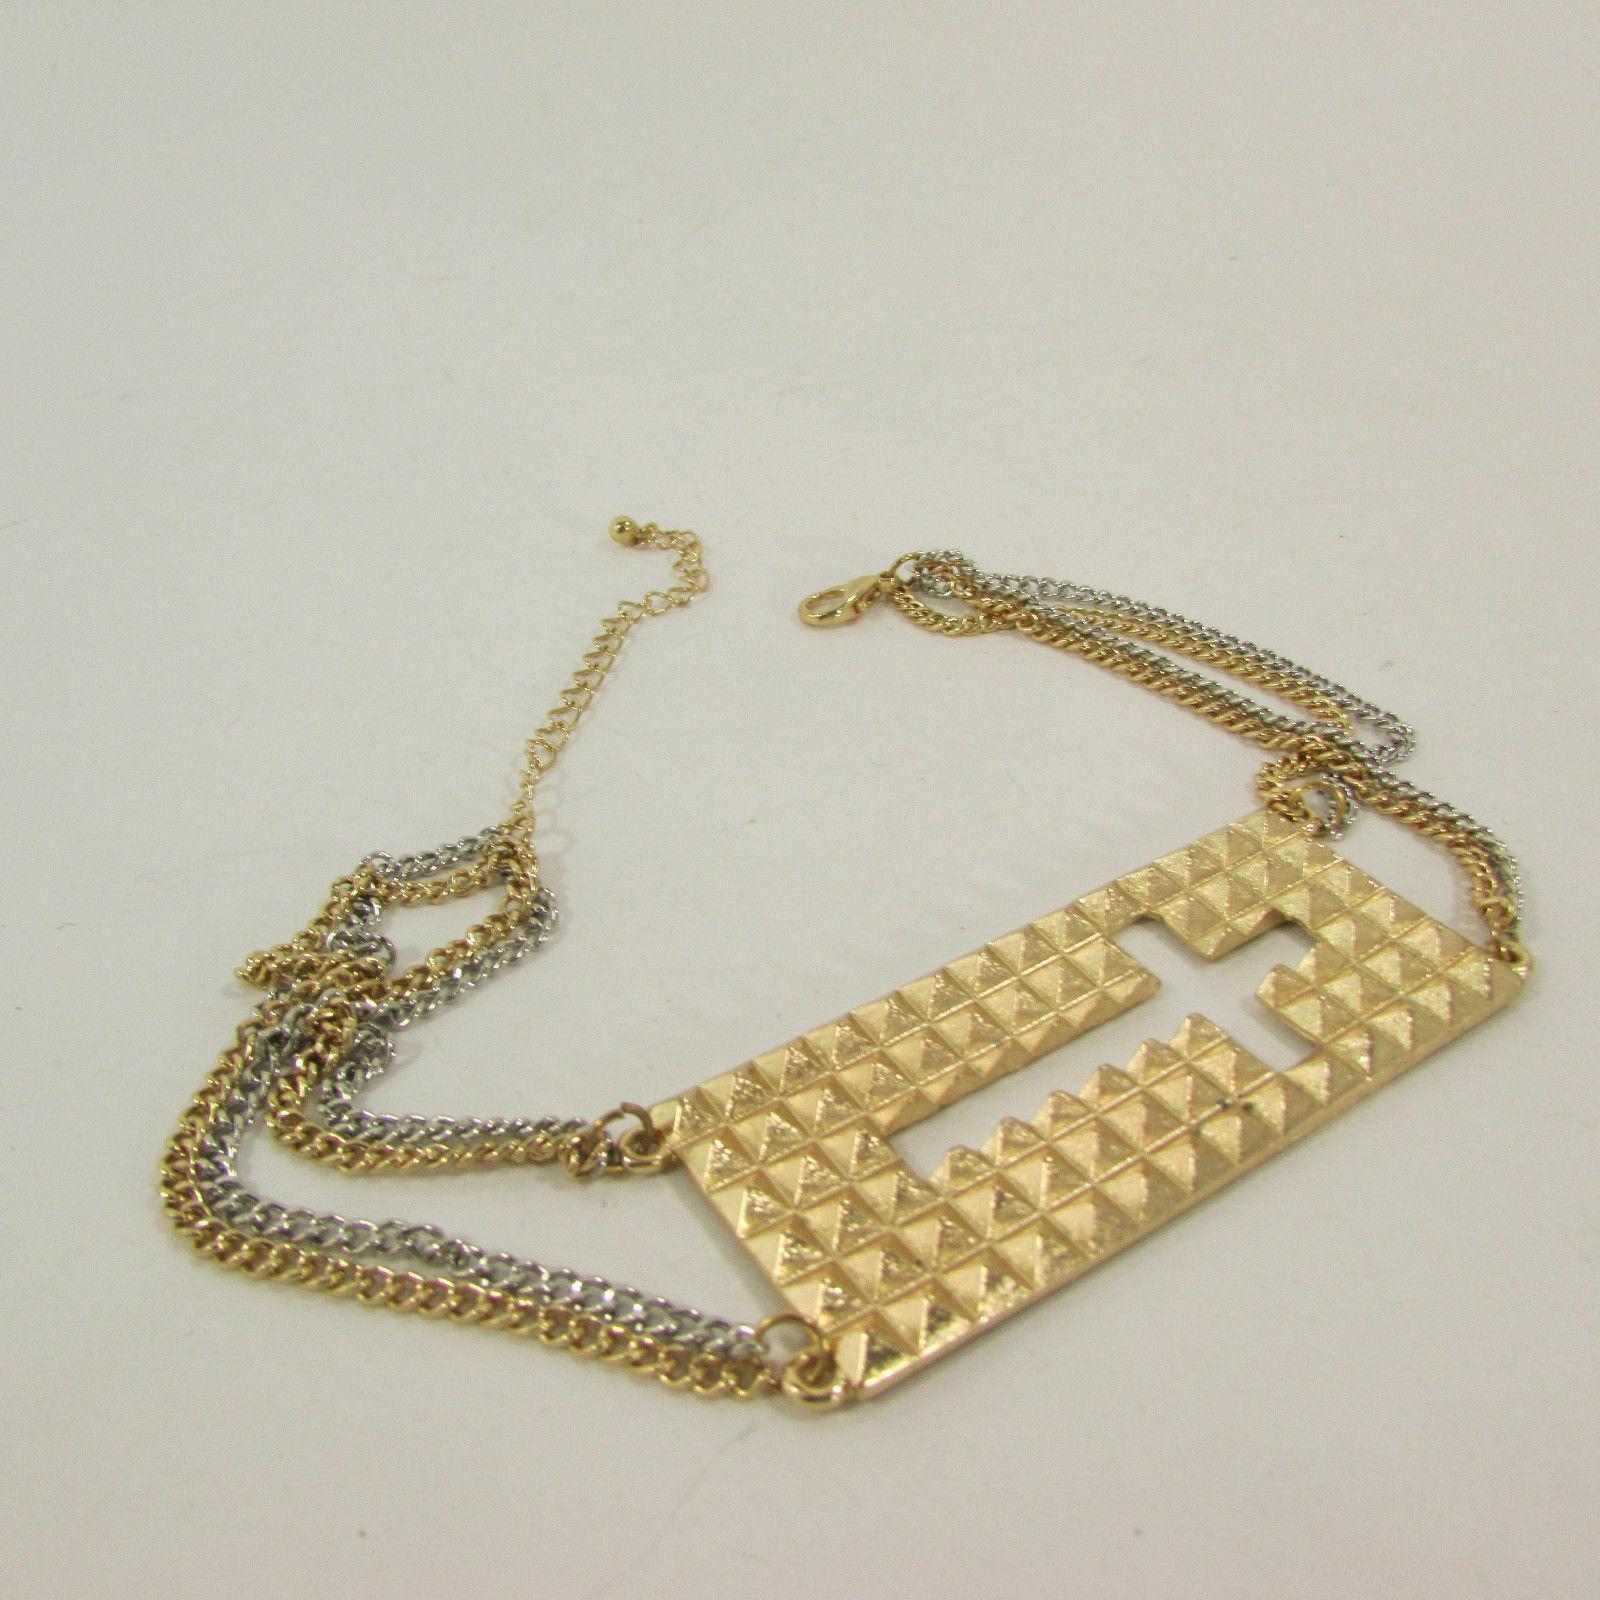 Mujer Moda Joyería Bota Brazalete Oro Placa Cruz Cadenas Zapato Bling Charm image 6